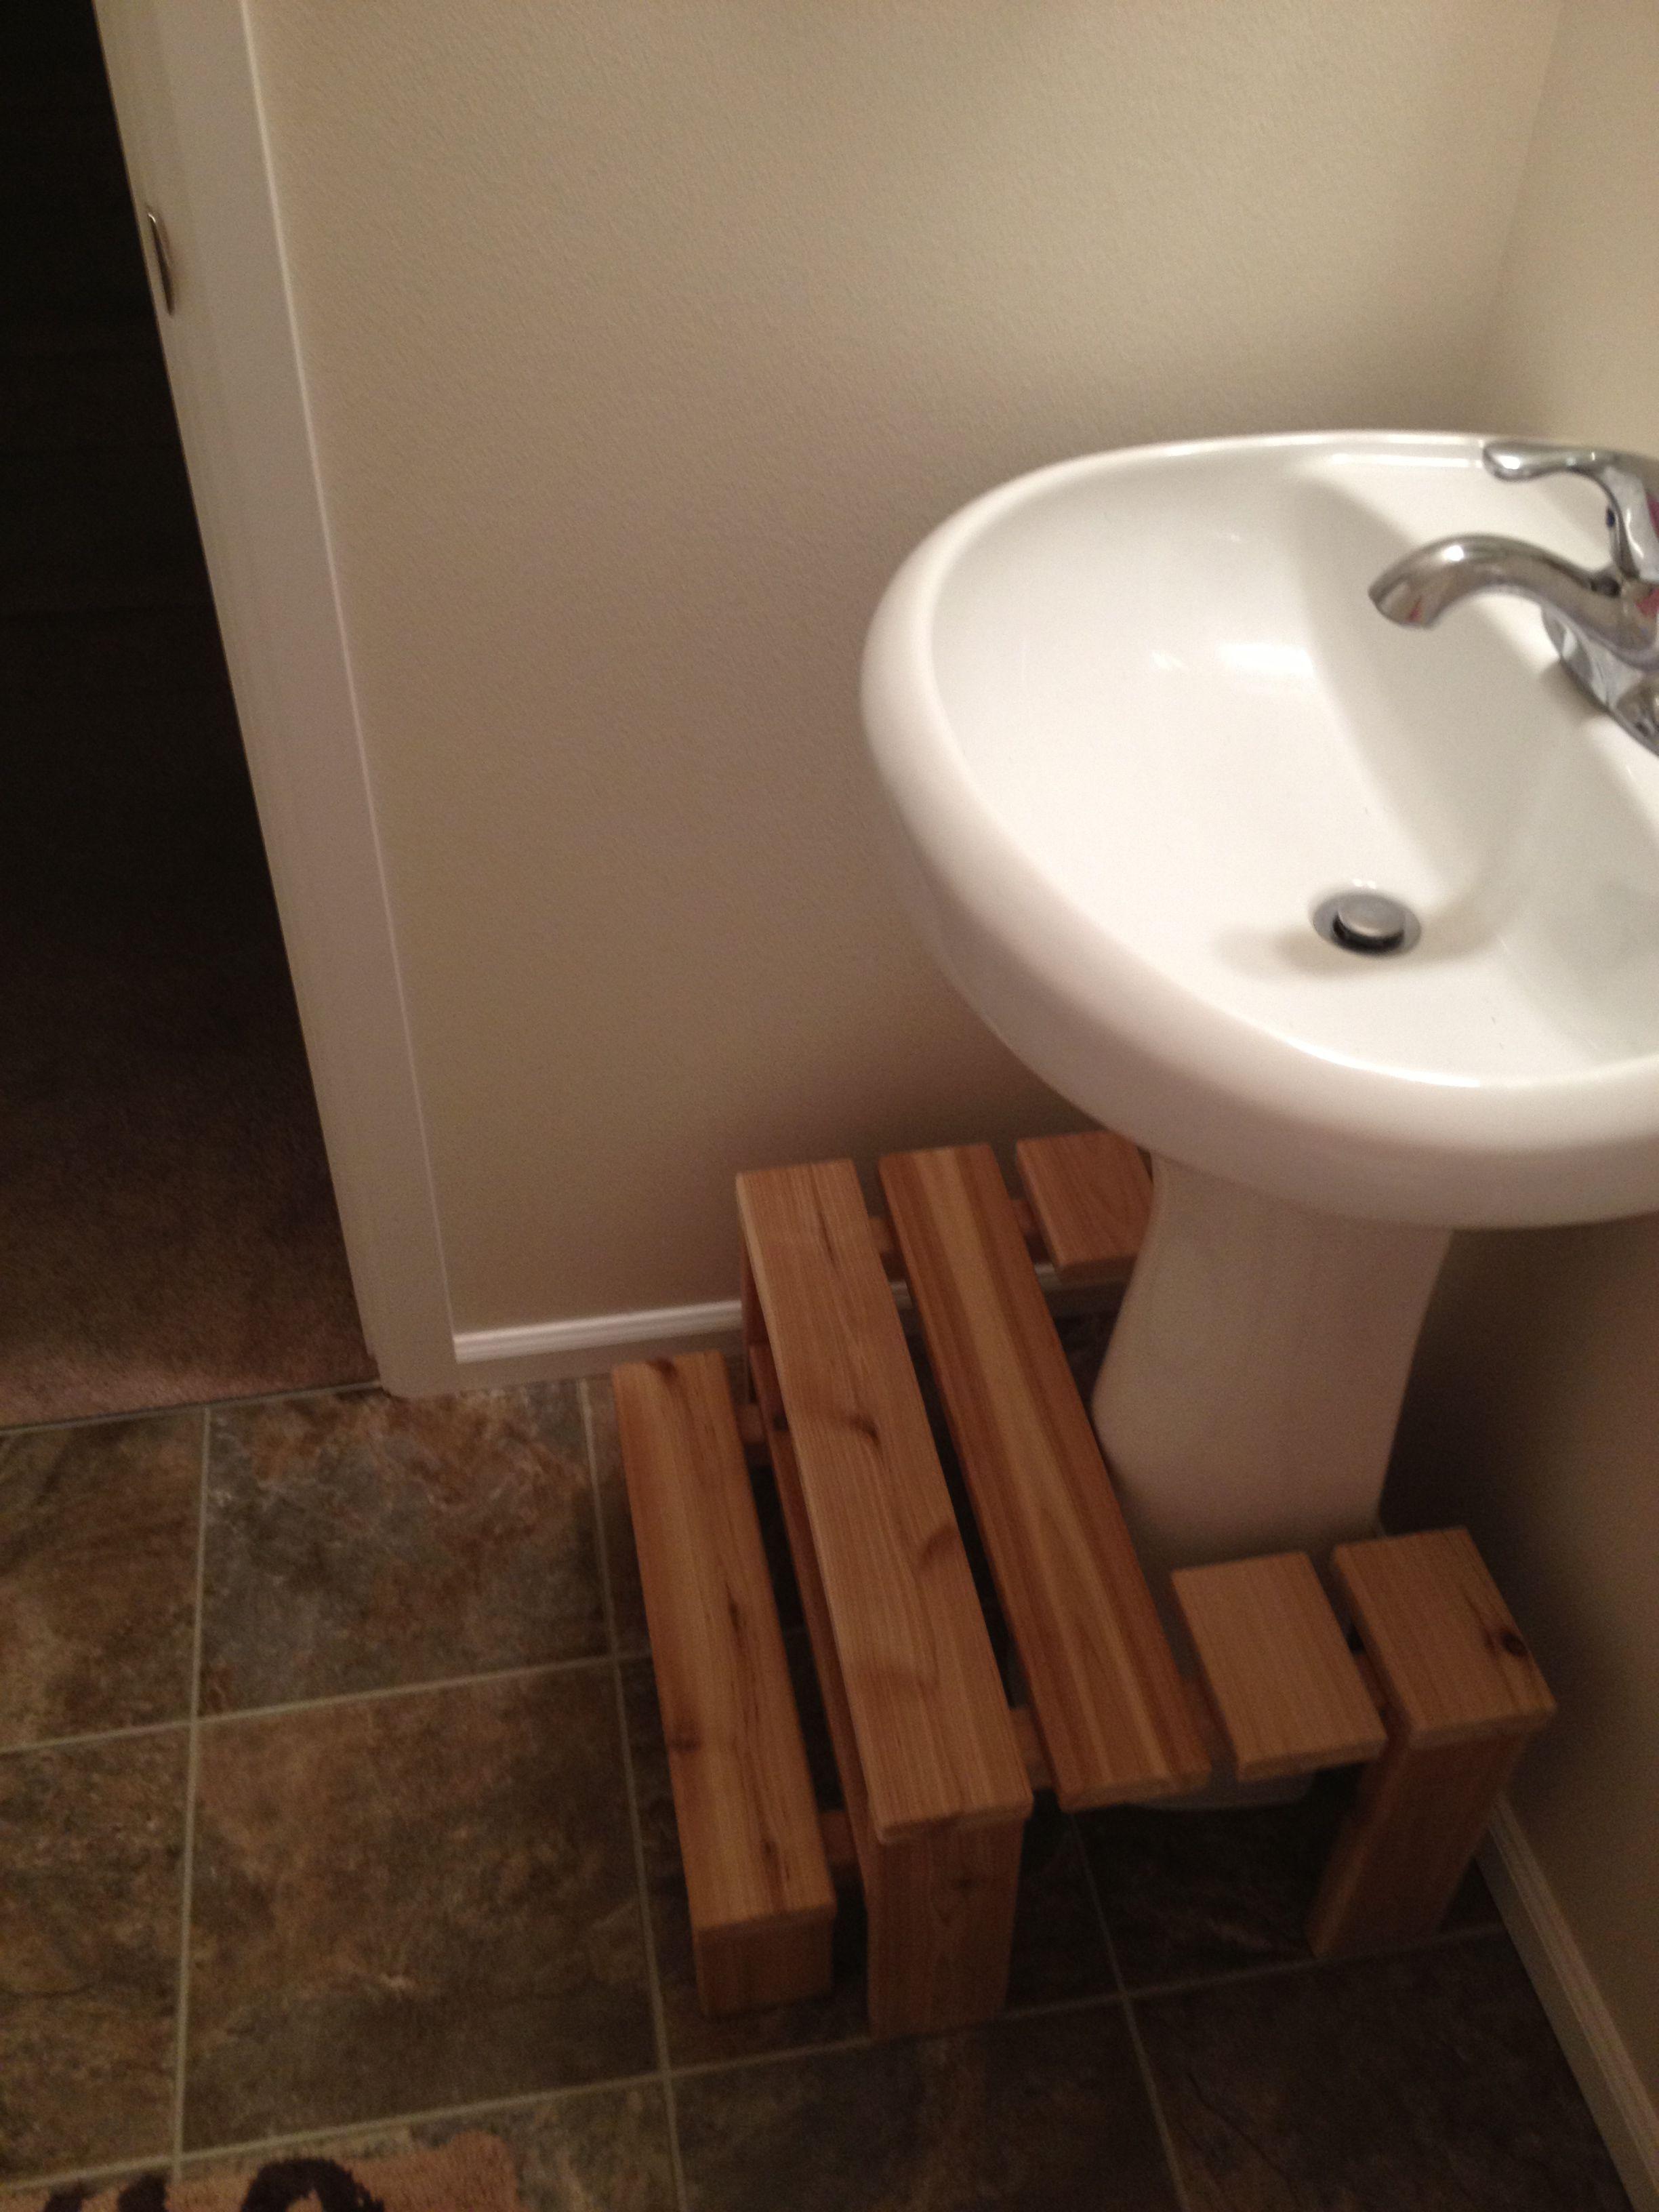 Small bathroom step stool | Ideas for Kids | Pinterest | Small ...